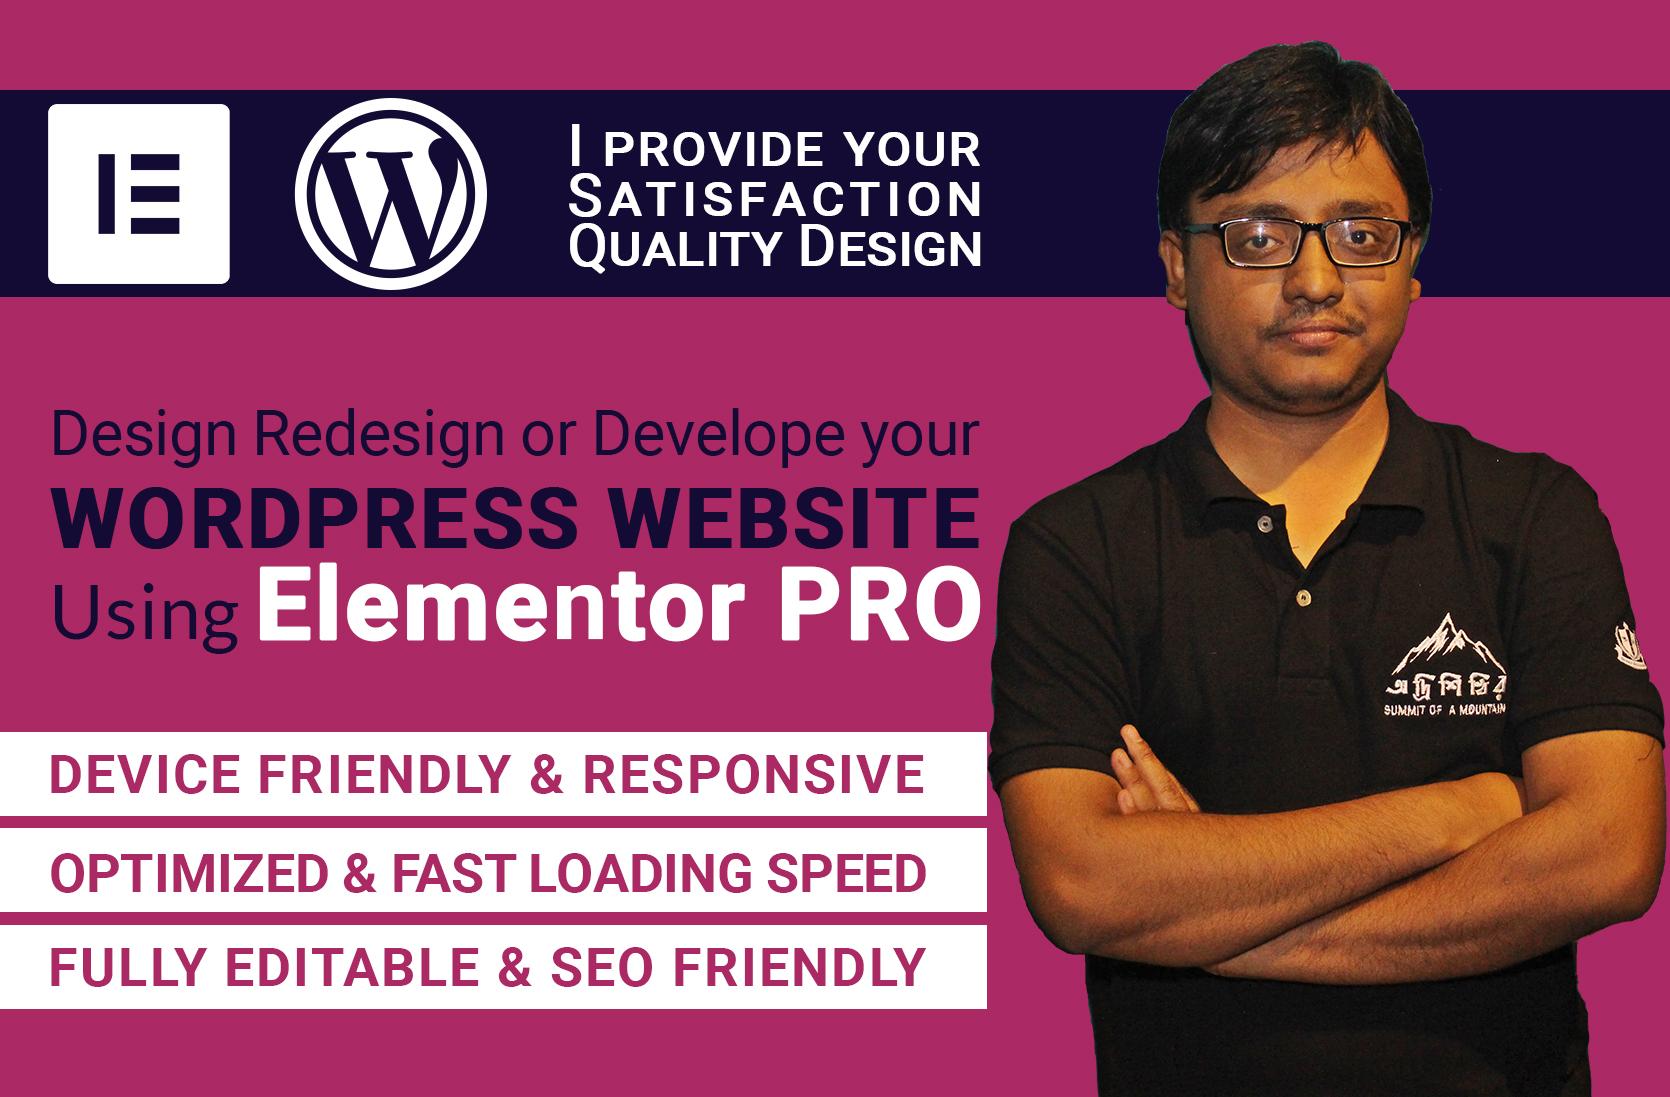 I will design redesign or develop your wordpress website using elementor pro